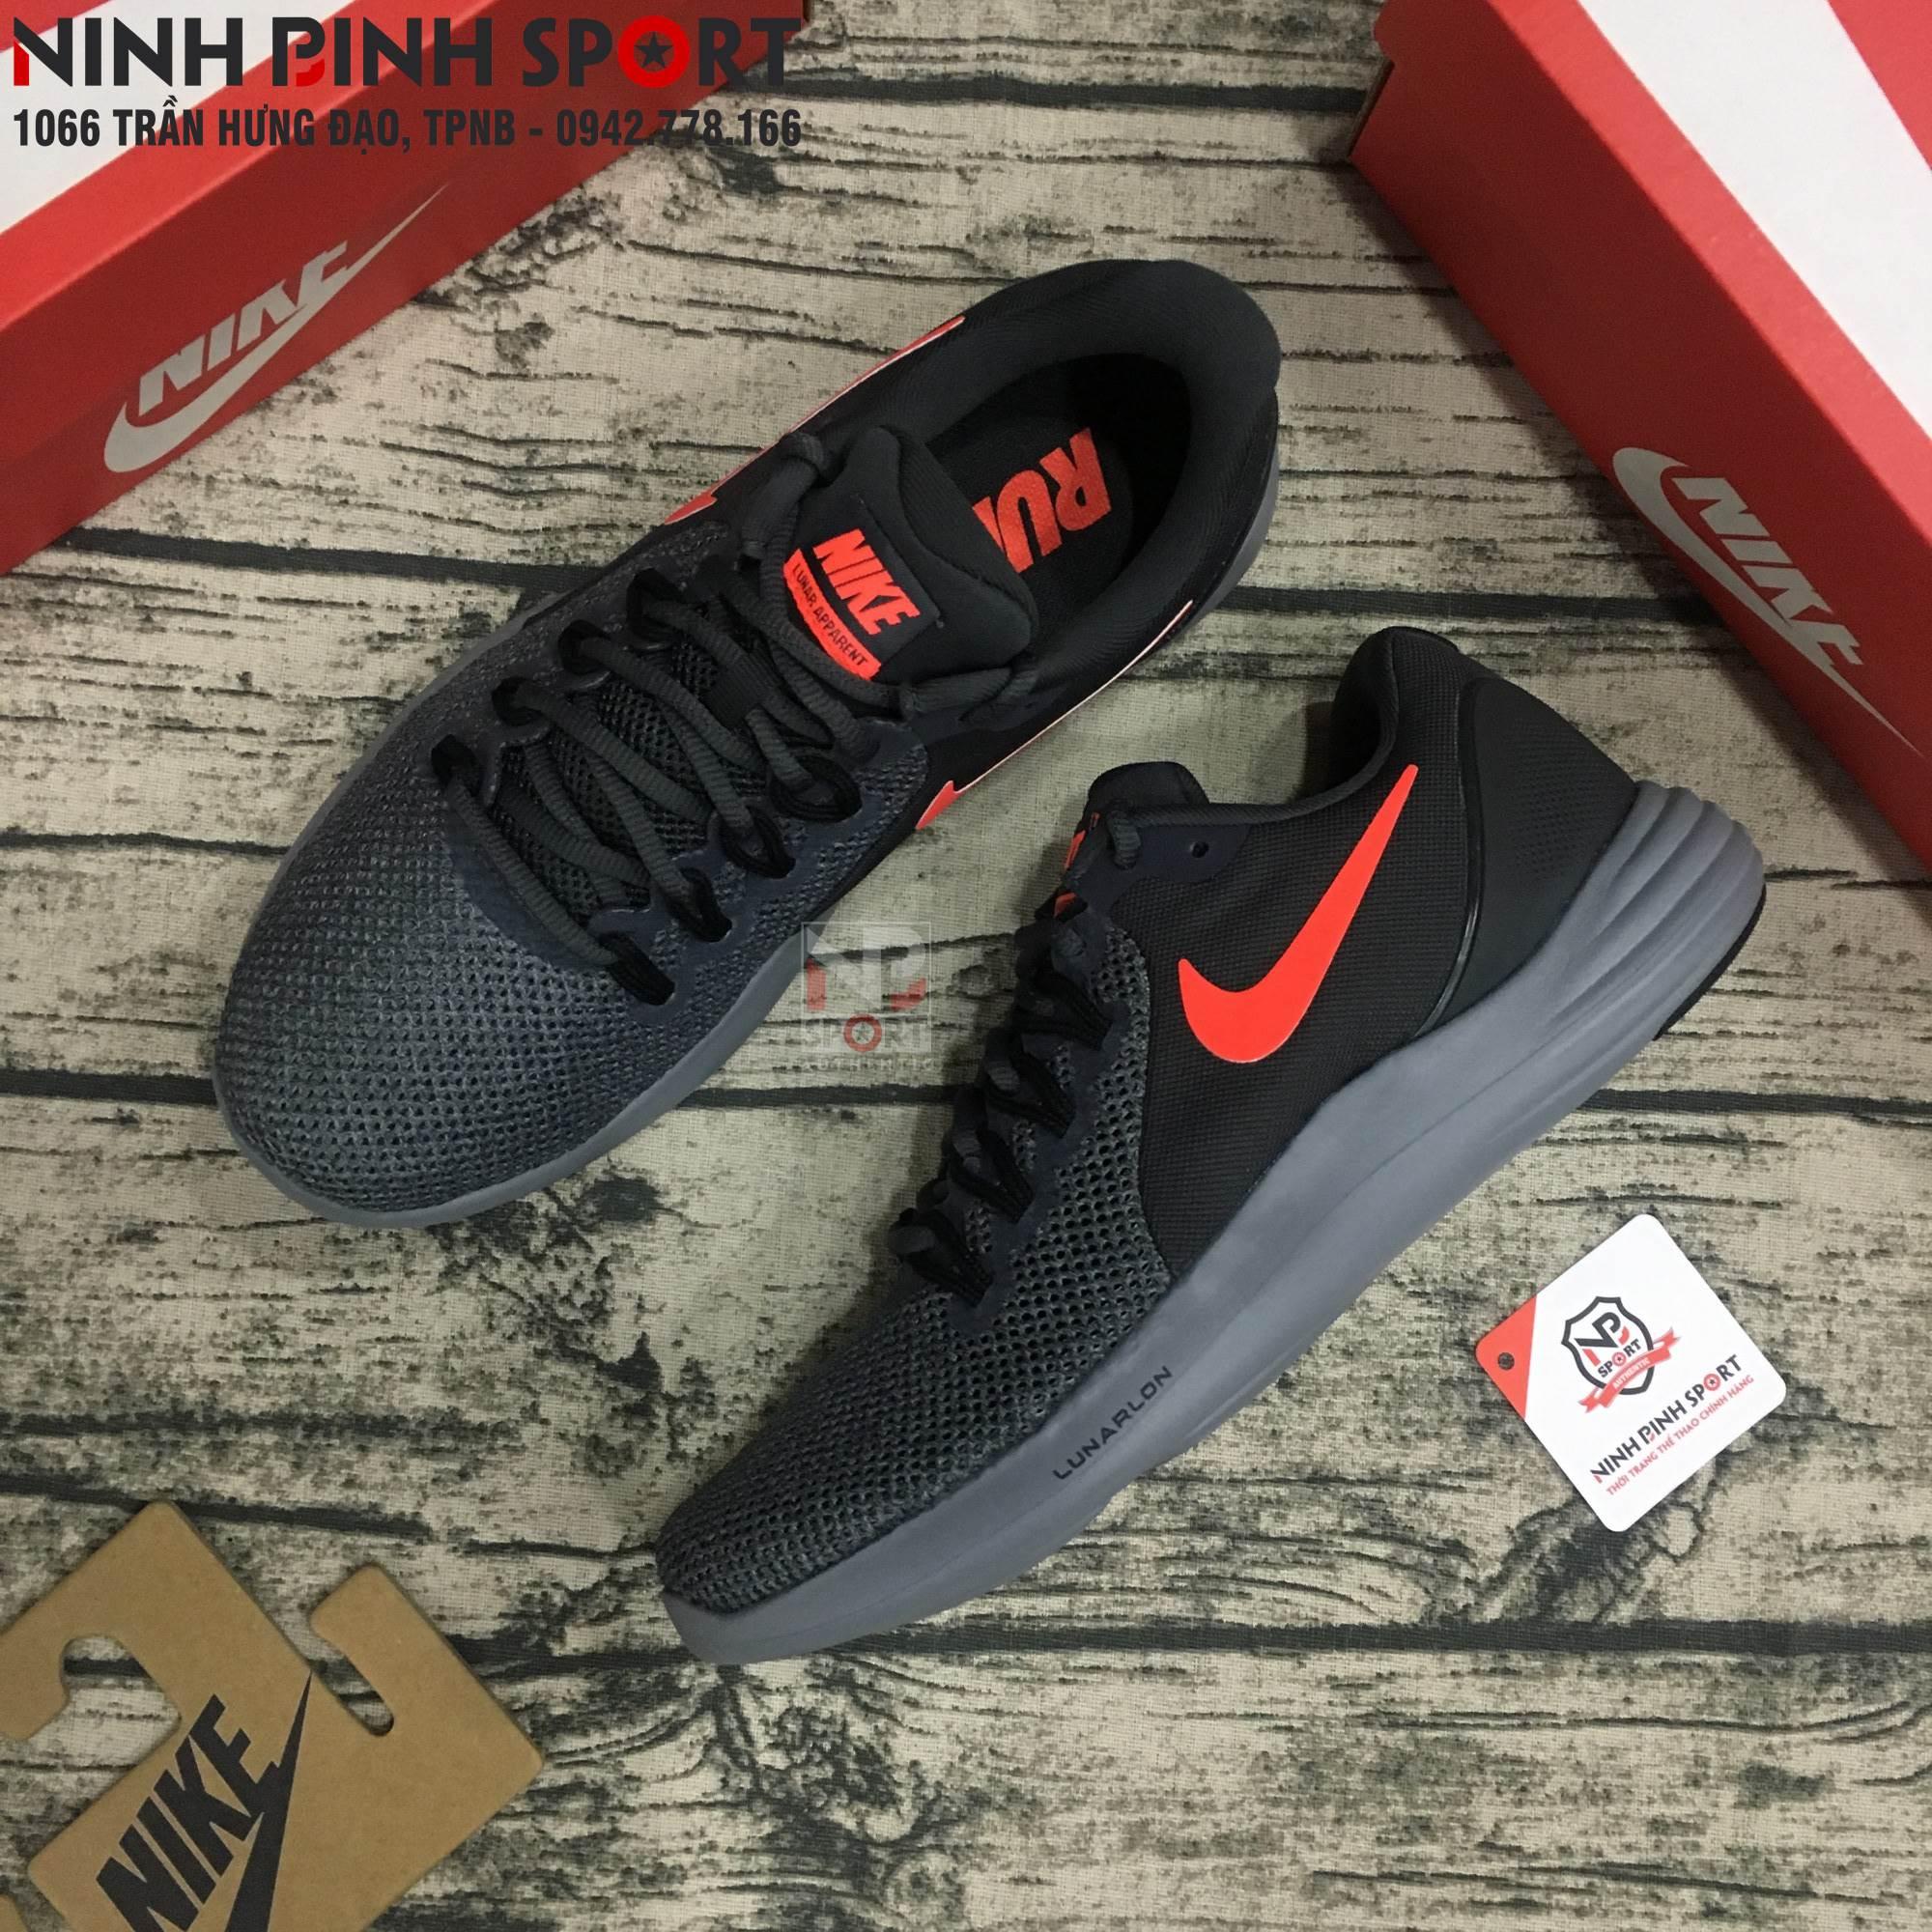 Giầy thể thao nam Nike Lunar Apparent 908987-006